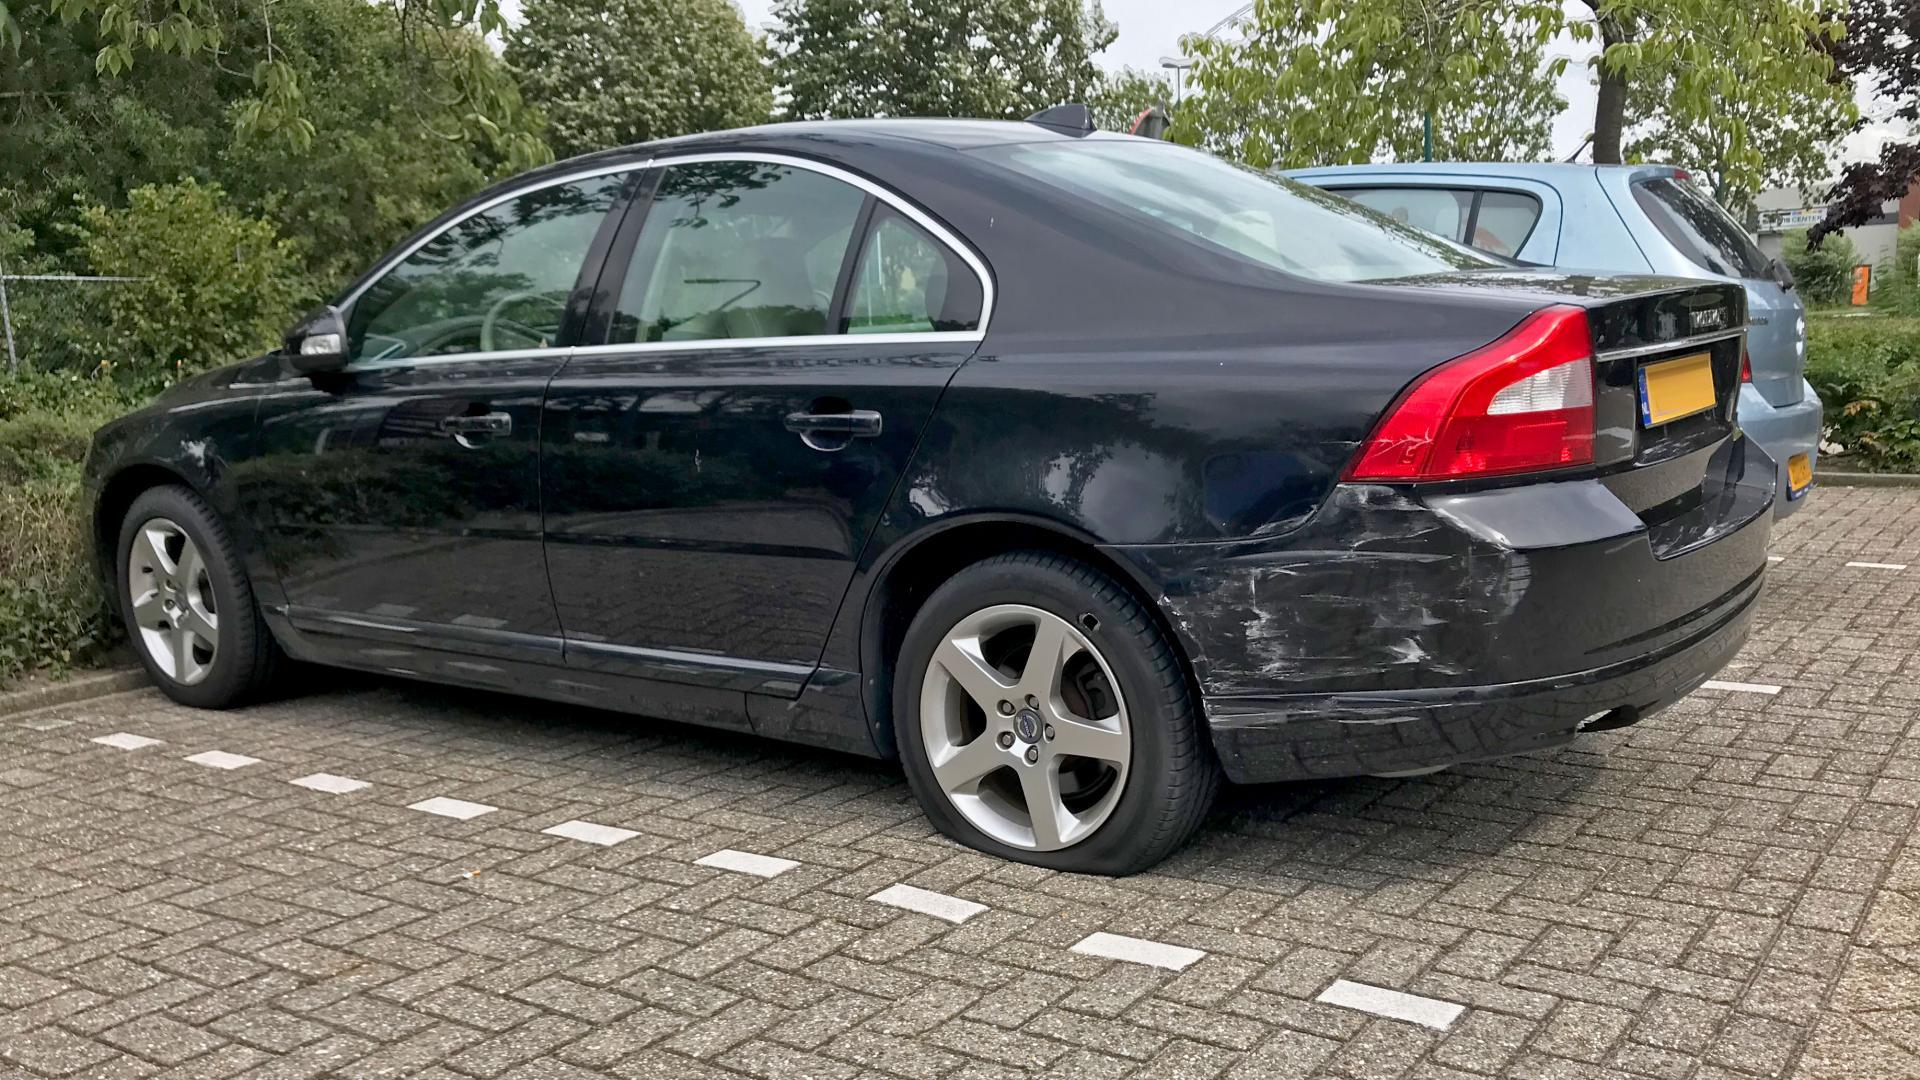 Volvo V70 met krassen schade en lekke band